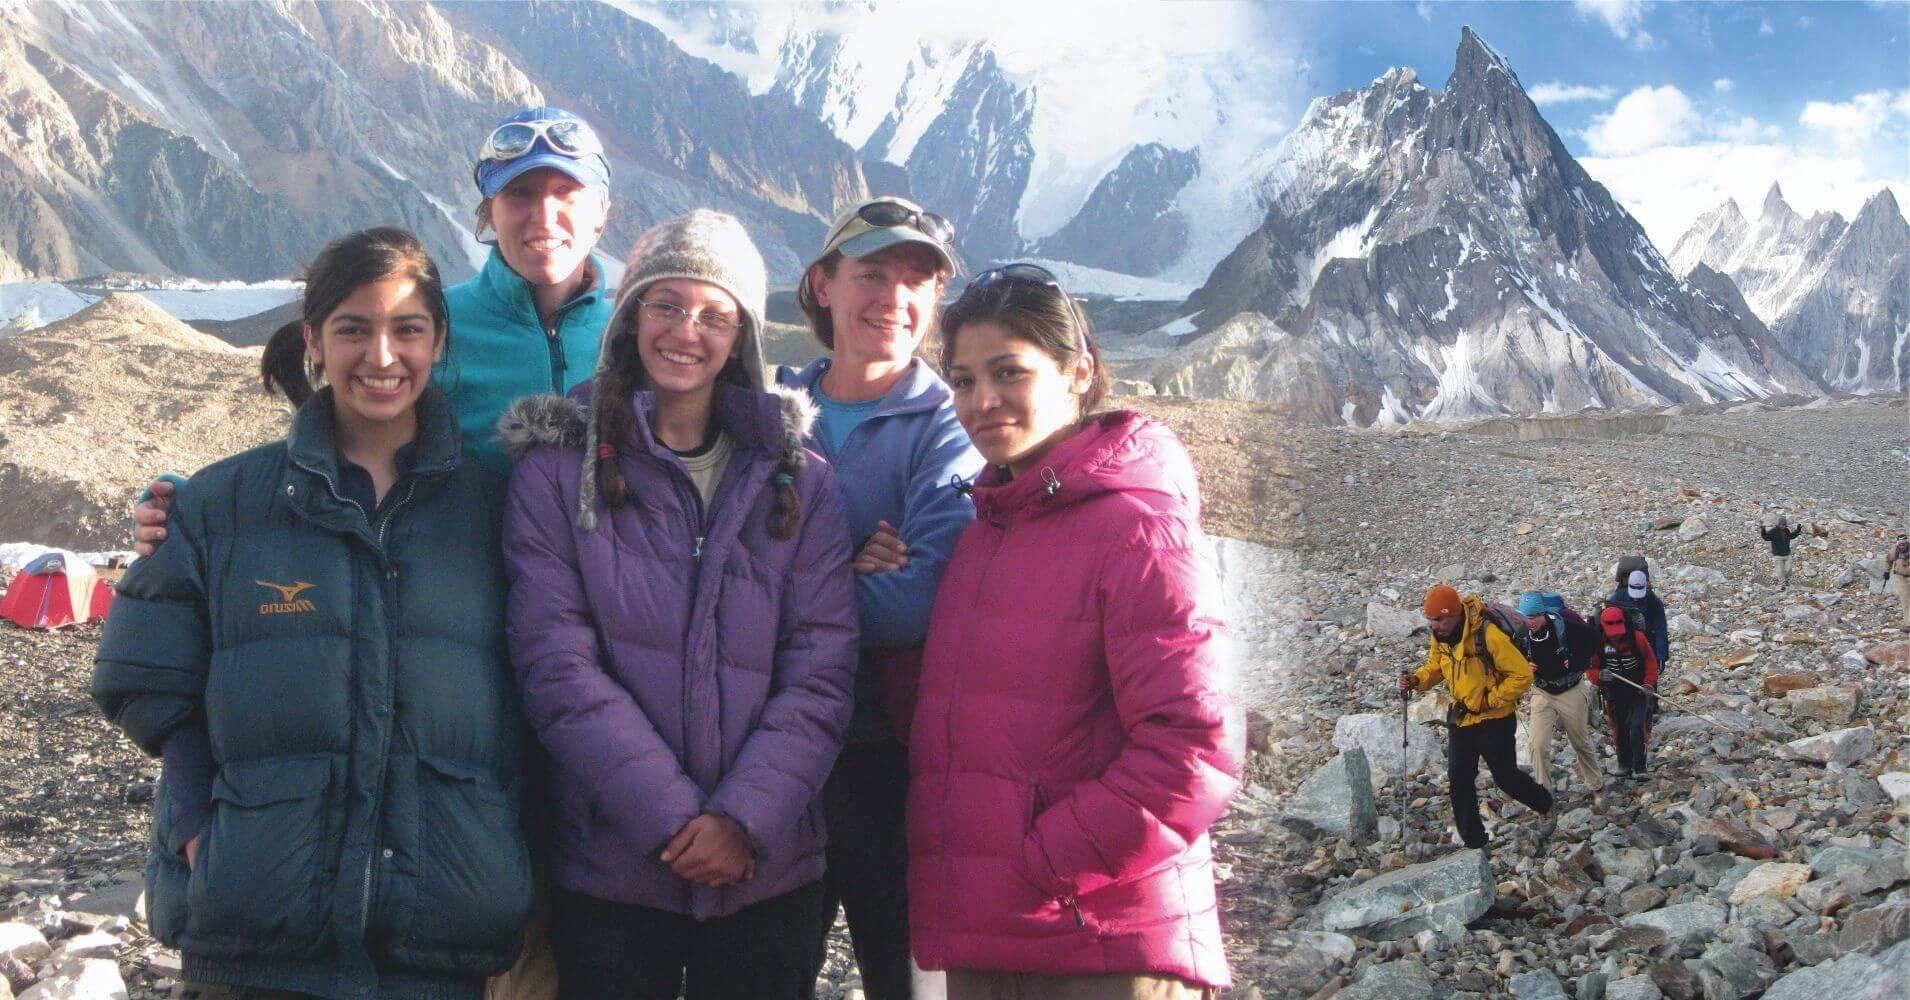 Trekking Campo Base del K2 en Pakistán.